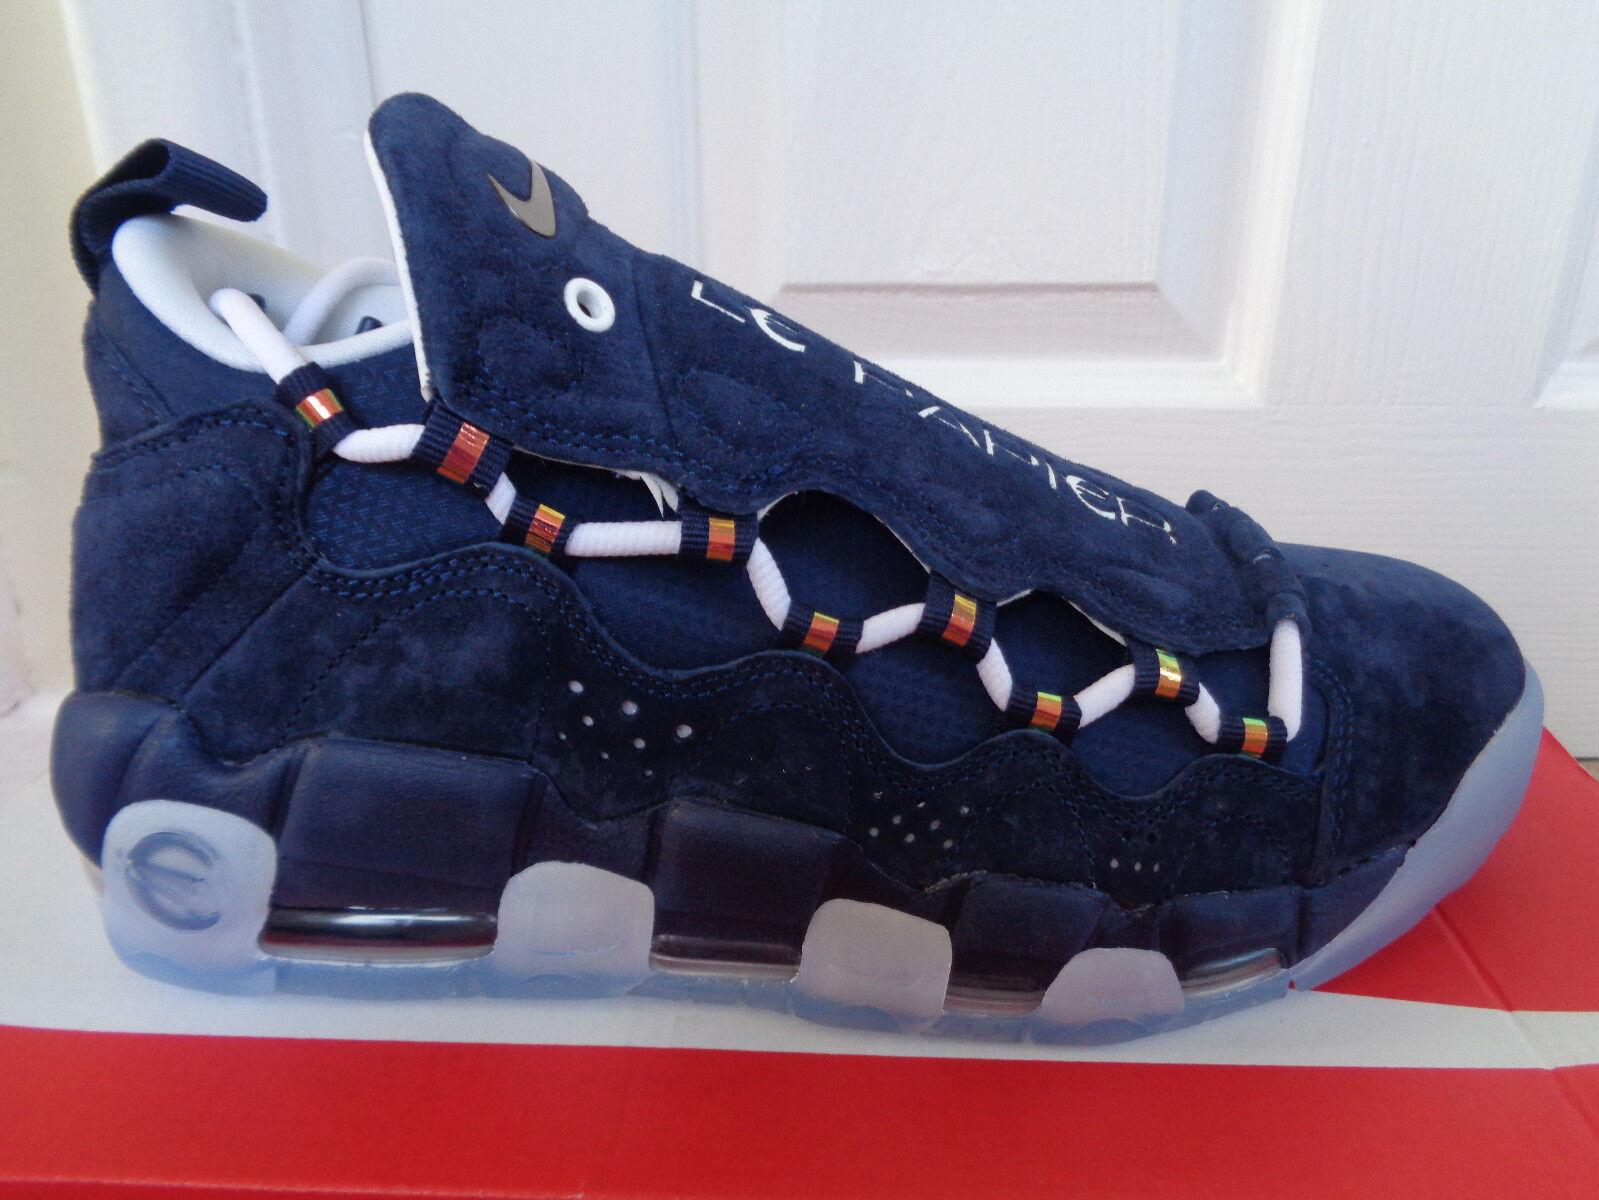 Nike air piu 'soldi qs formatori scarpe scarpe aj7383 ue nuovi 40 noi 7 nuovi ue + box 5c81f8